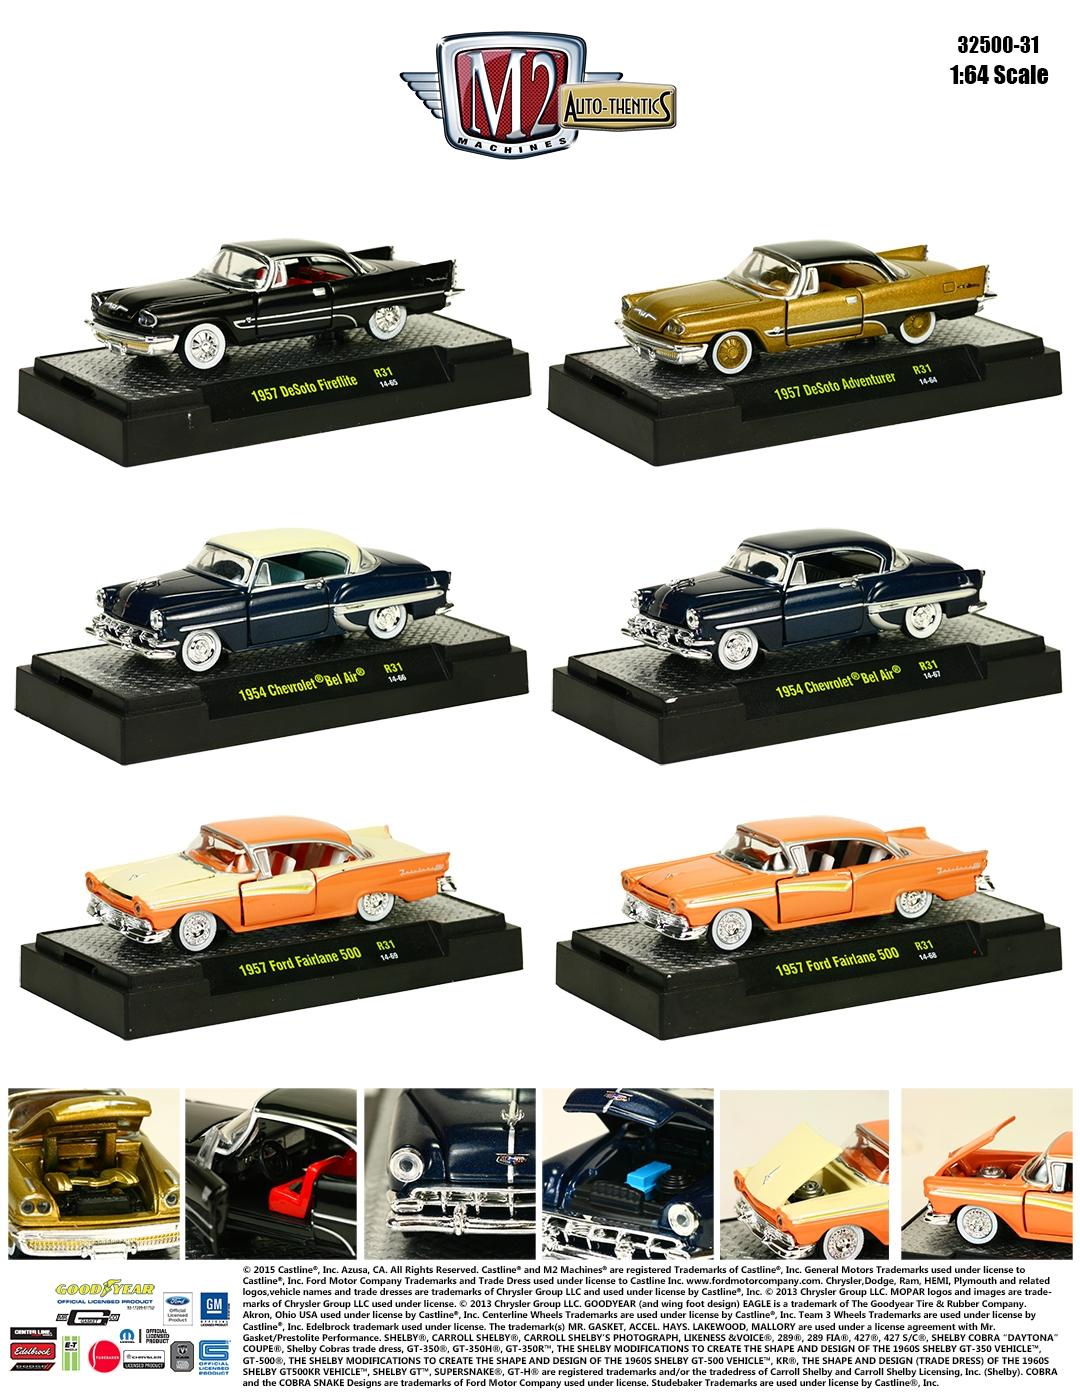 1:64 American Classics Sneak Peek: M2 Auto-Thentics Series 31